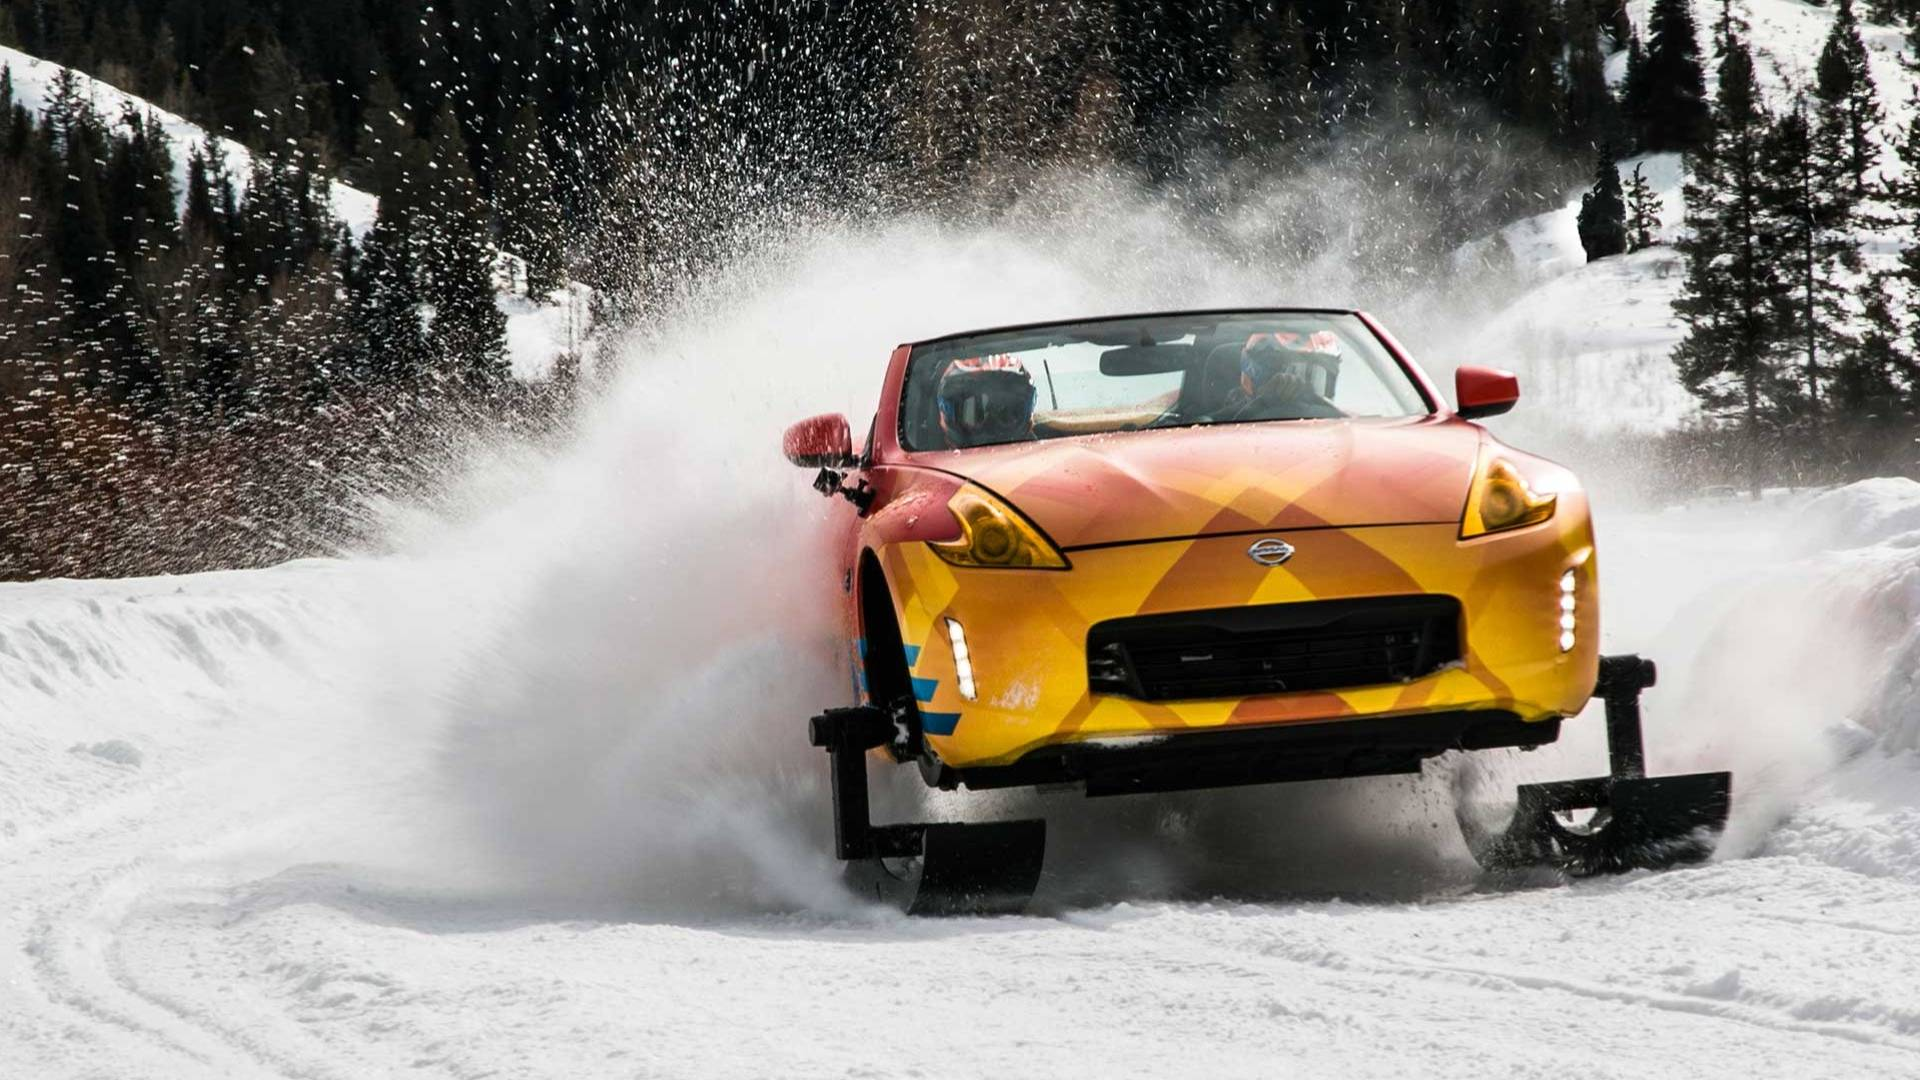 Photo of Το Nissan 370Zki έχει ερπύστριες και δεν μασάει στο χιόνι! [vid]